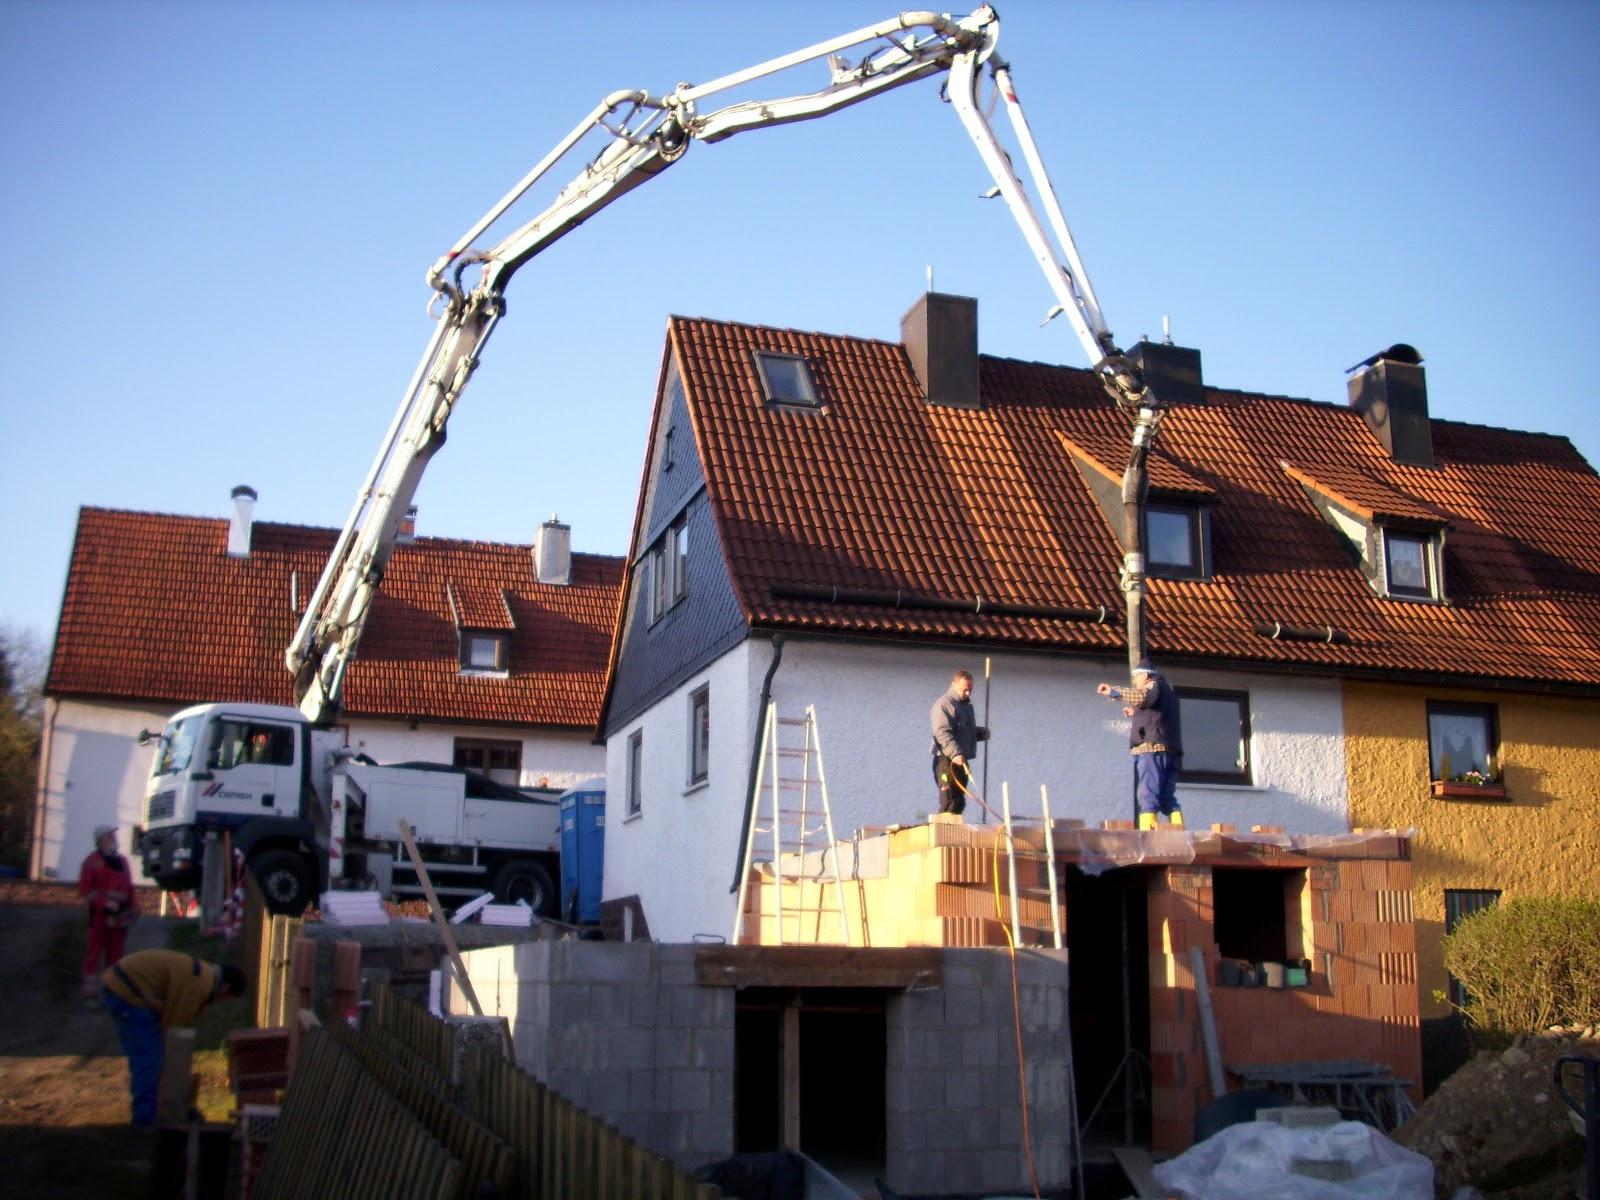 scheler bau baustelle hofmann decke betonieren. Black Bedroom Furniture Sets. Home Design Ideas